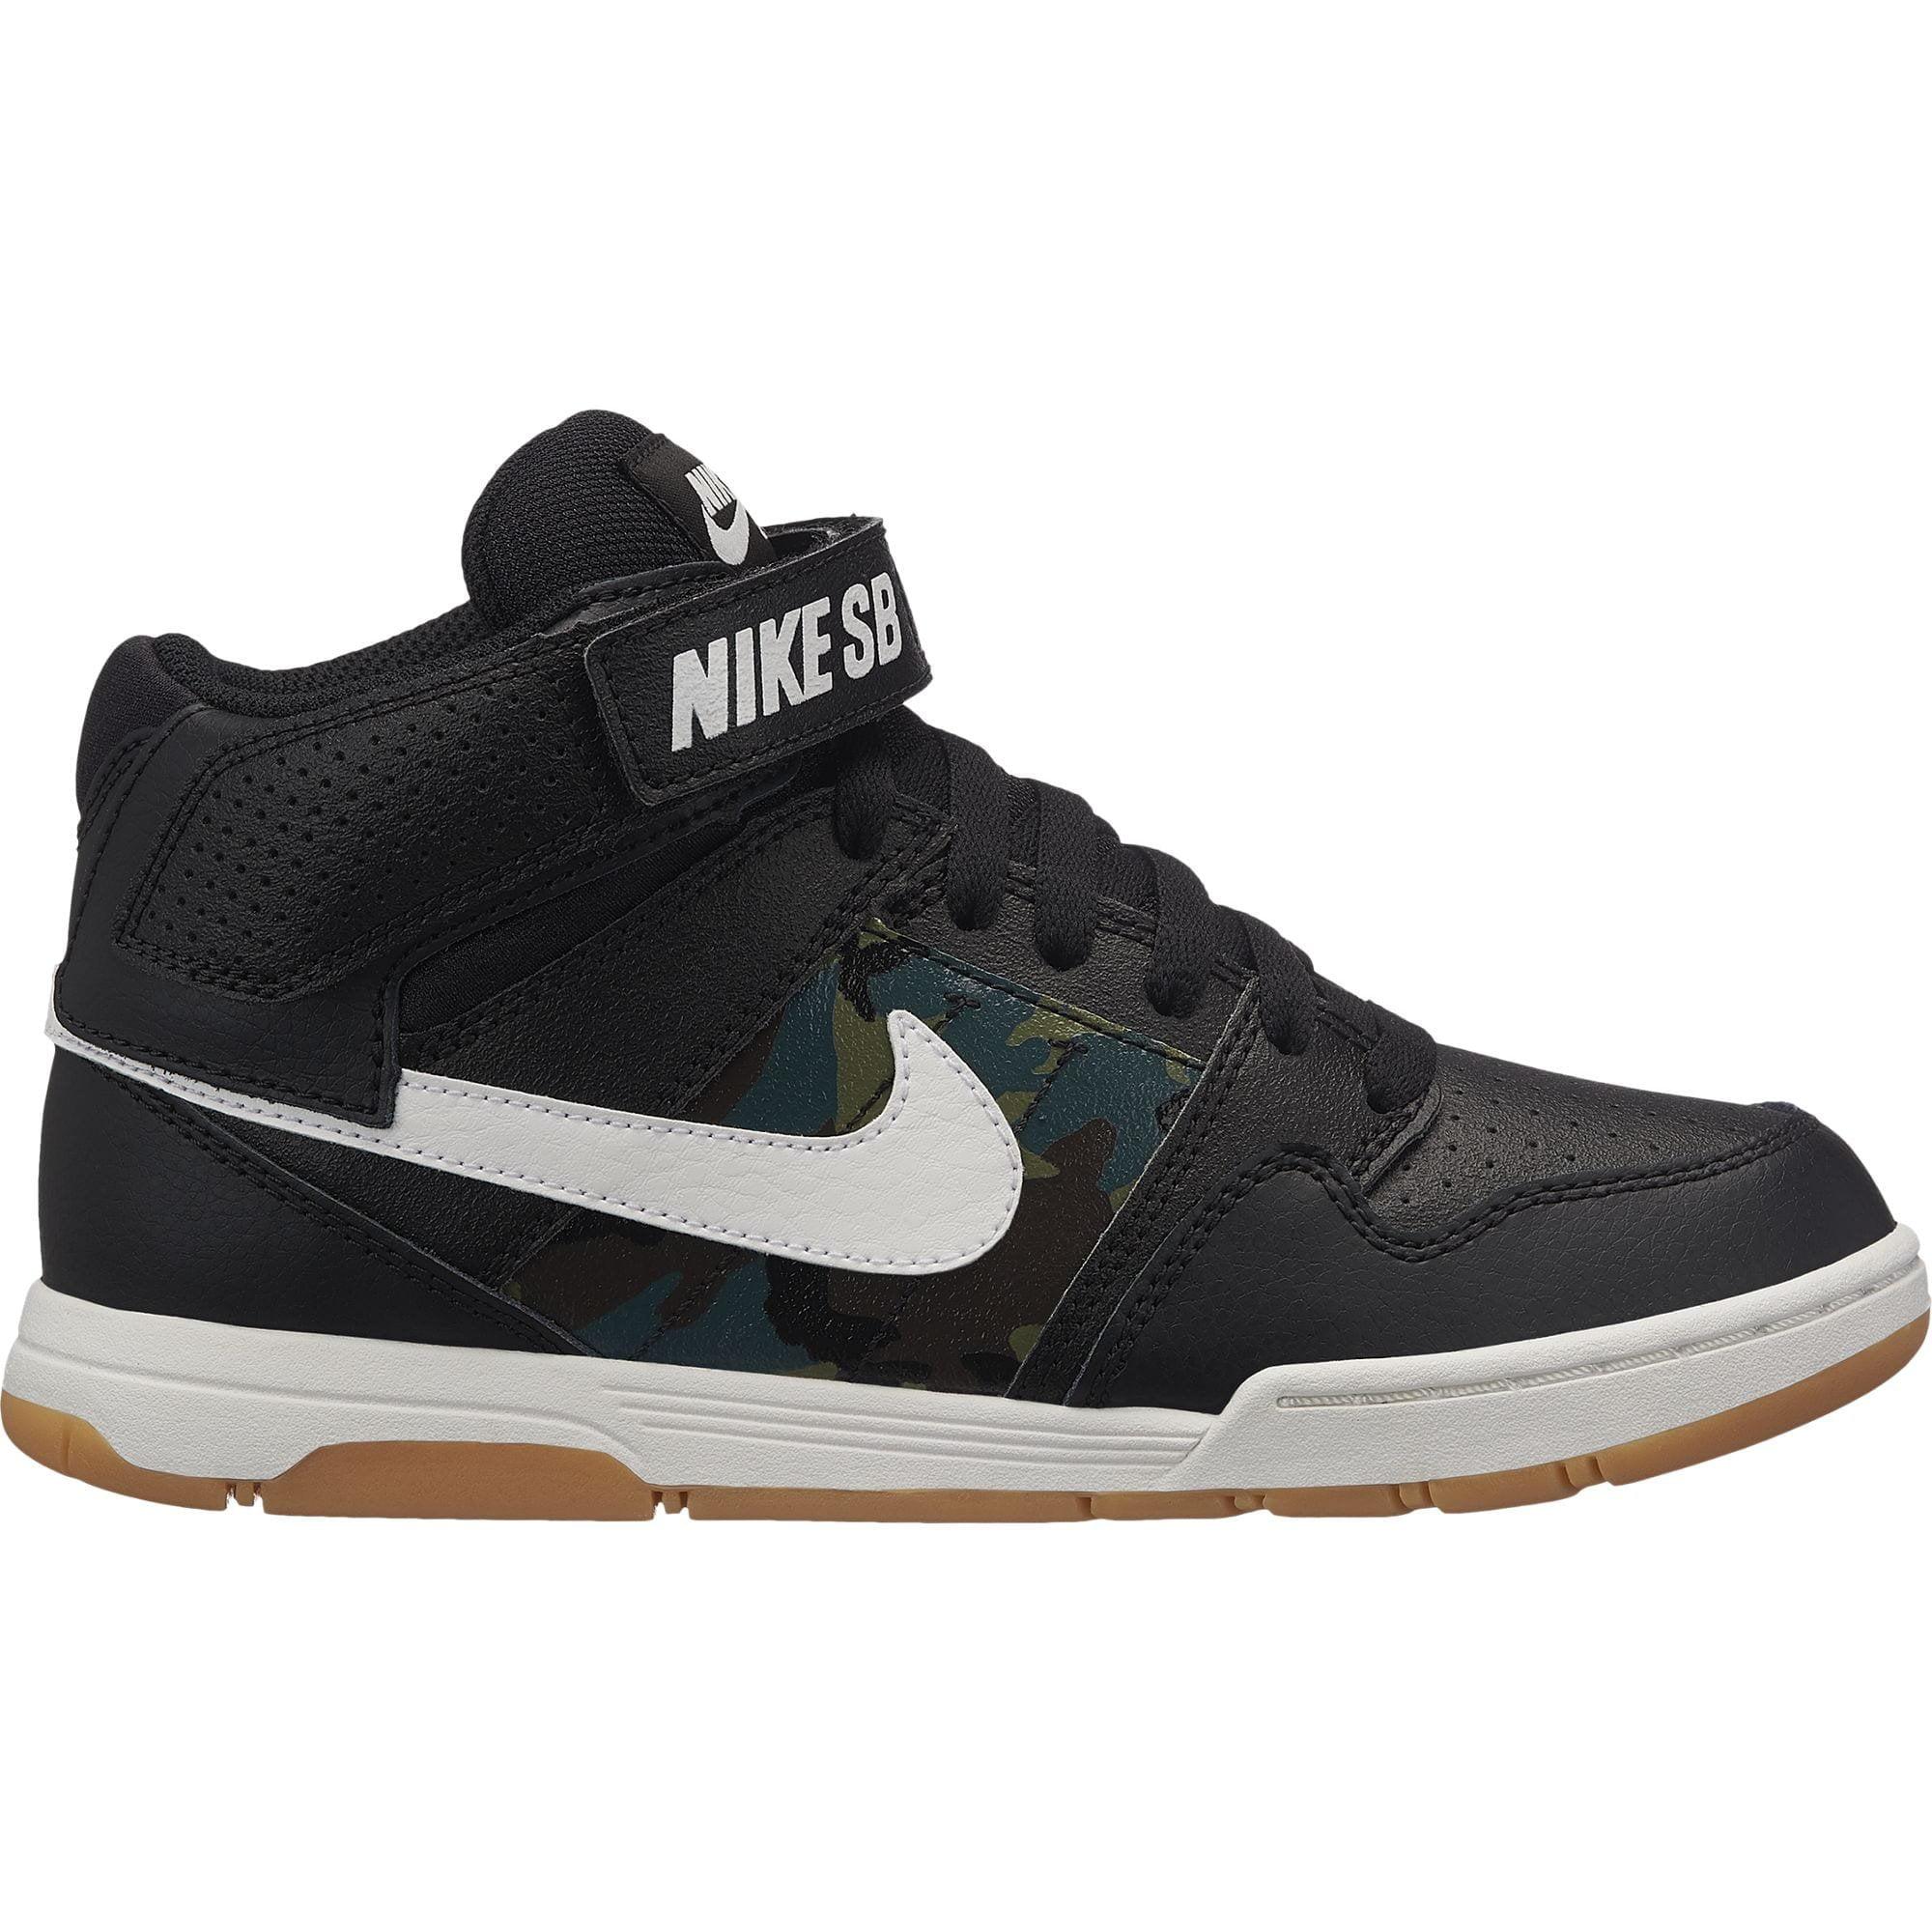 Nike 645025-019: Nike SB Kids Big Kid Mogan Mid 2 Black White Gum Sneaker by Nike